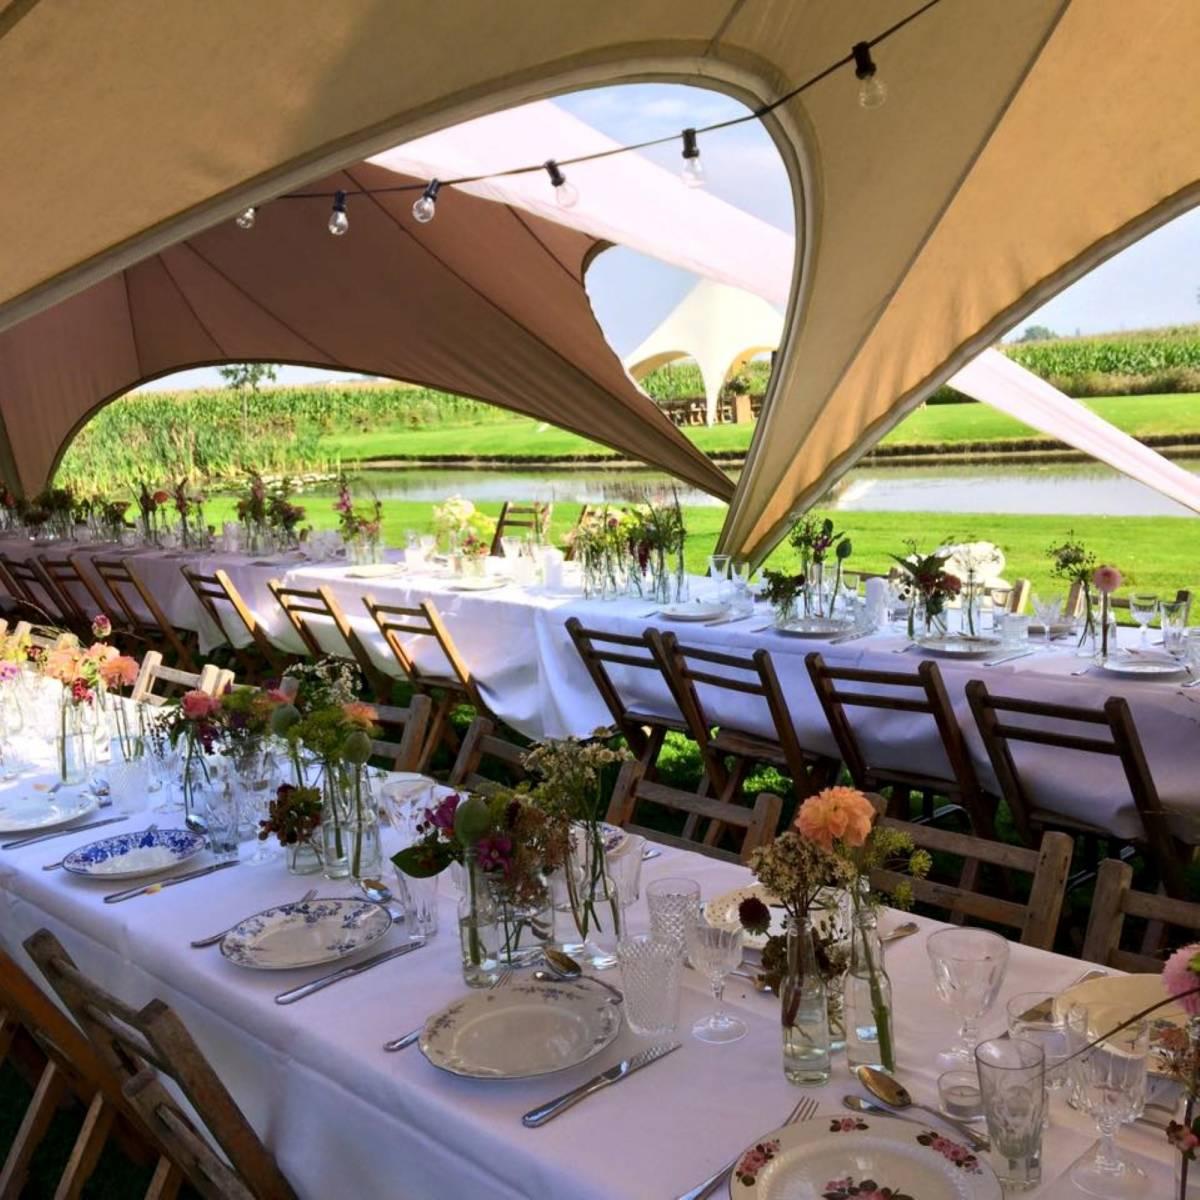 House of Weddings Domein t Eikennest Feestzaal Catering ceremonie West Vlaanderen slaapkamers (5)